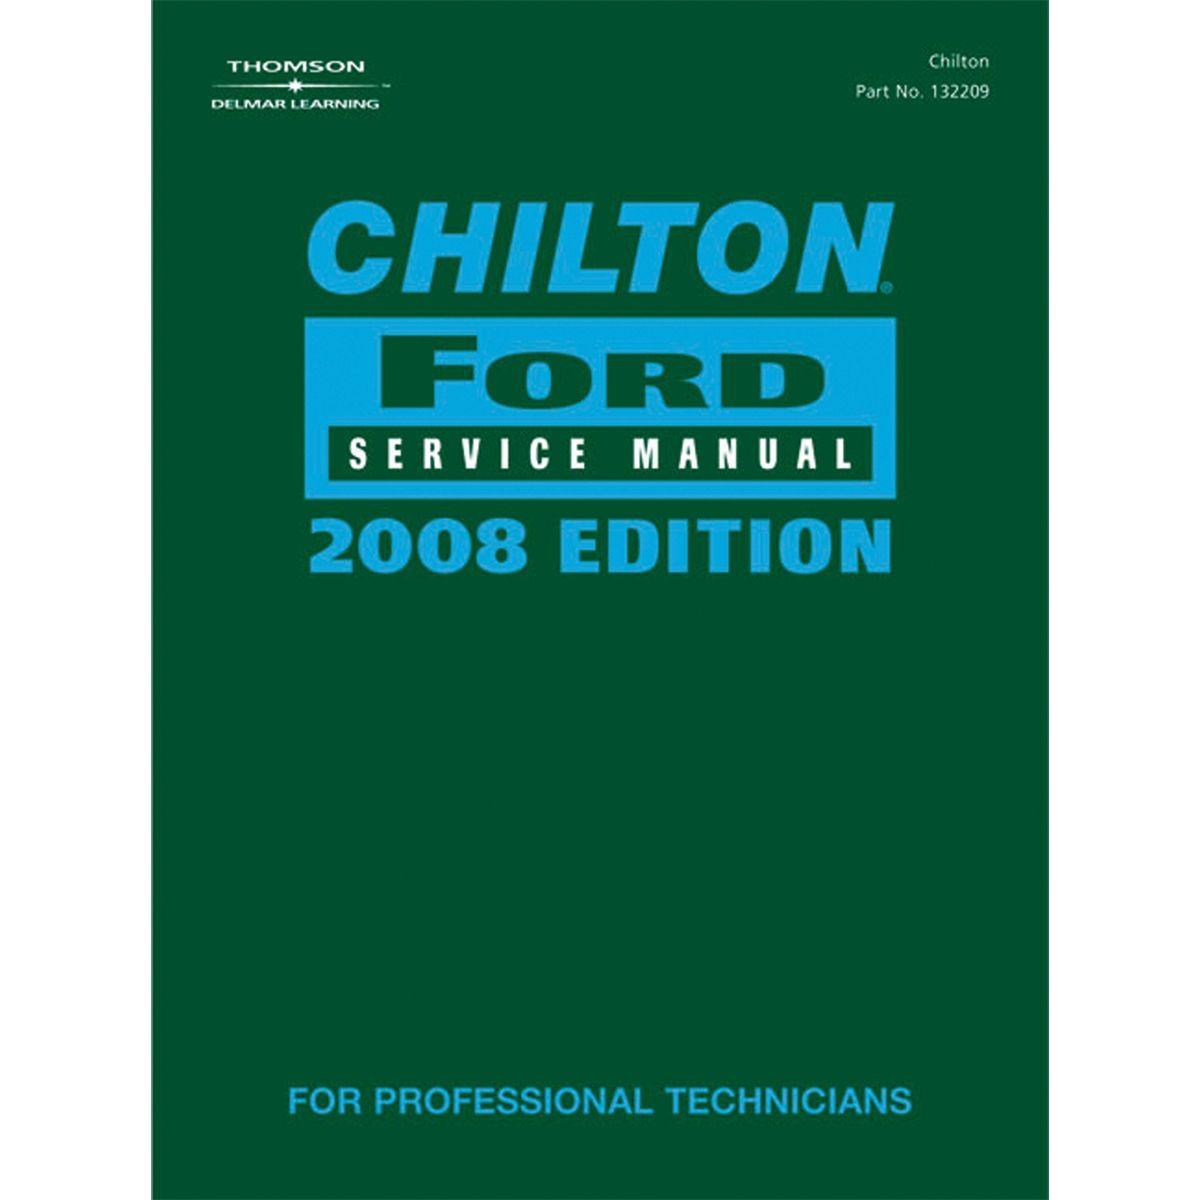 Ford Service Manuals: Chilton 142208 Ford Service Manual